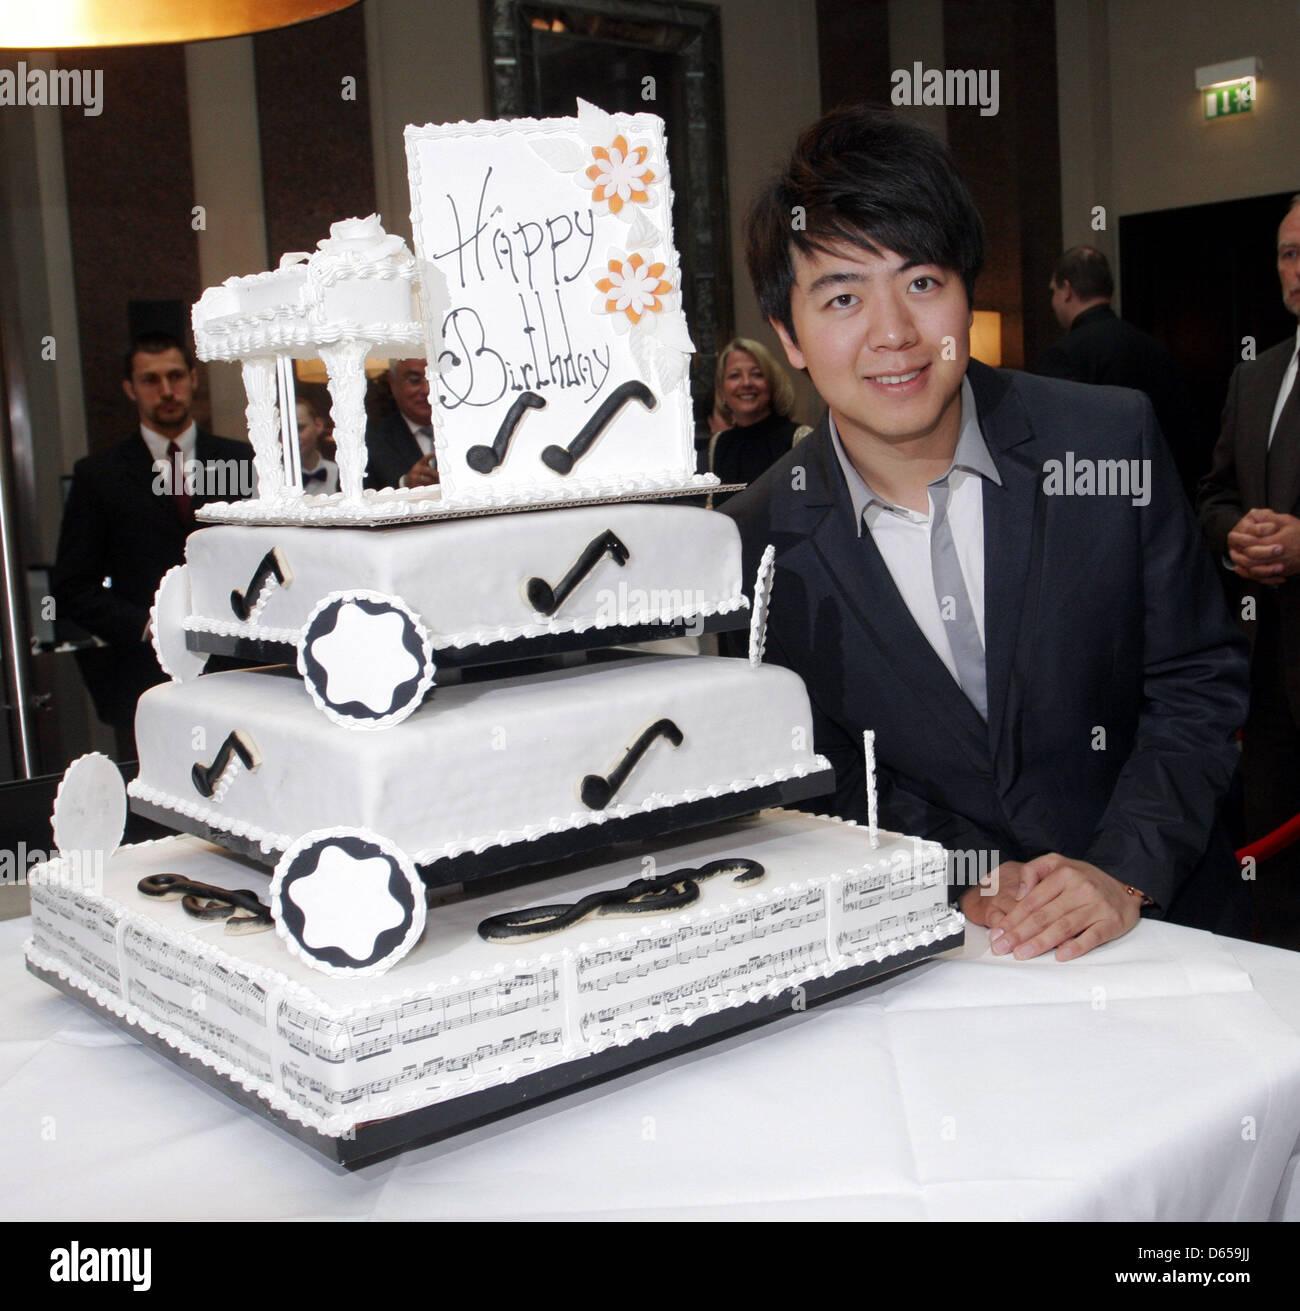 Where To Buy Birthday Cake In Berlin